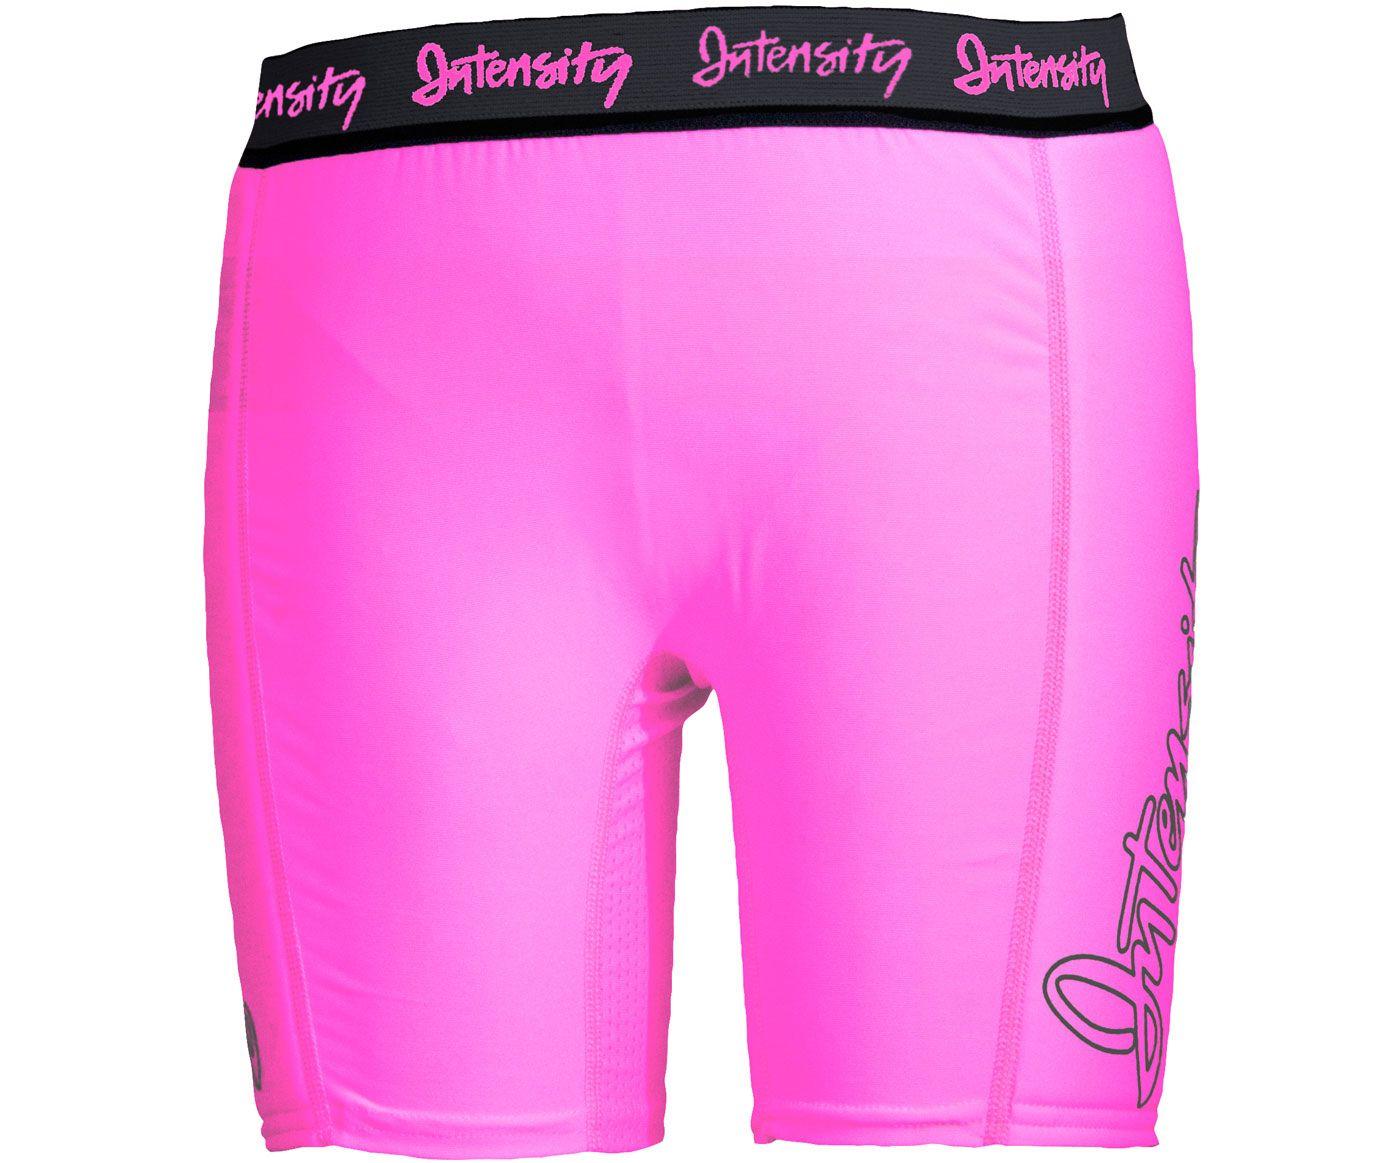 Intensity Girls' Low Rise Sliding Shorts